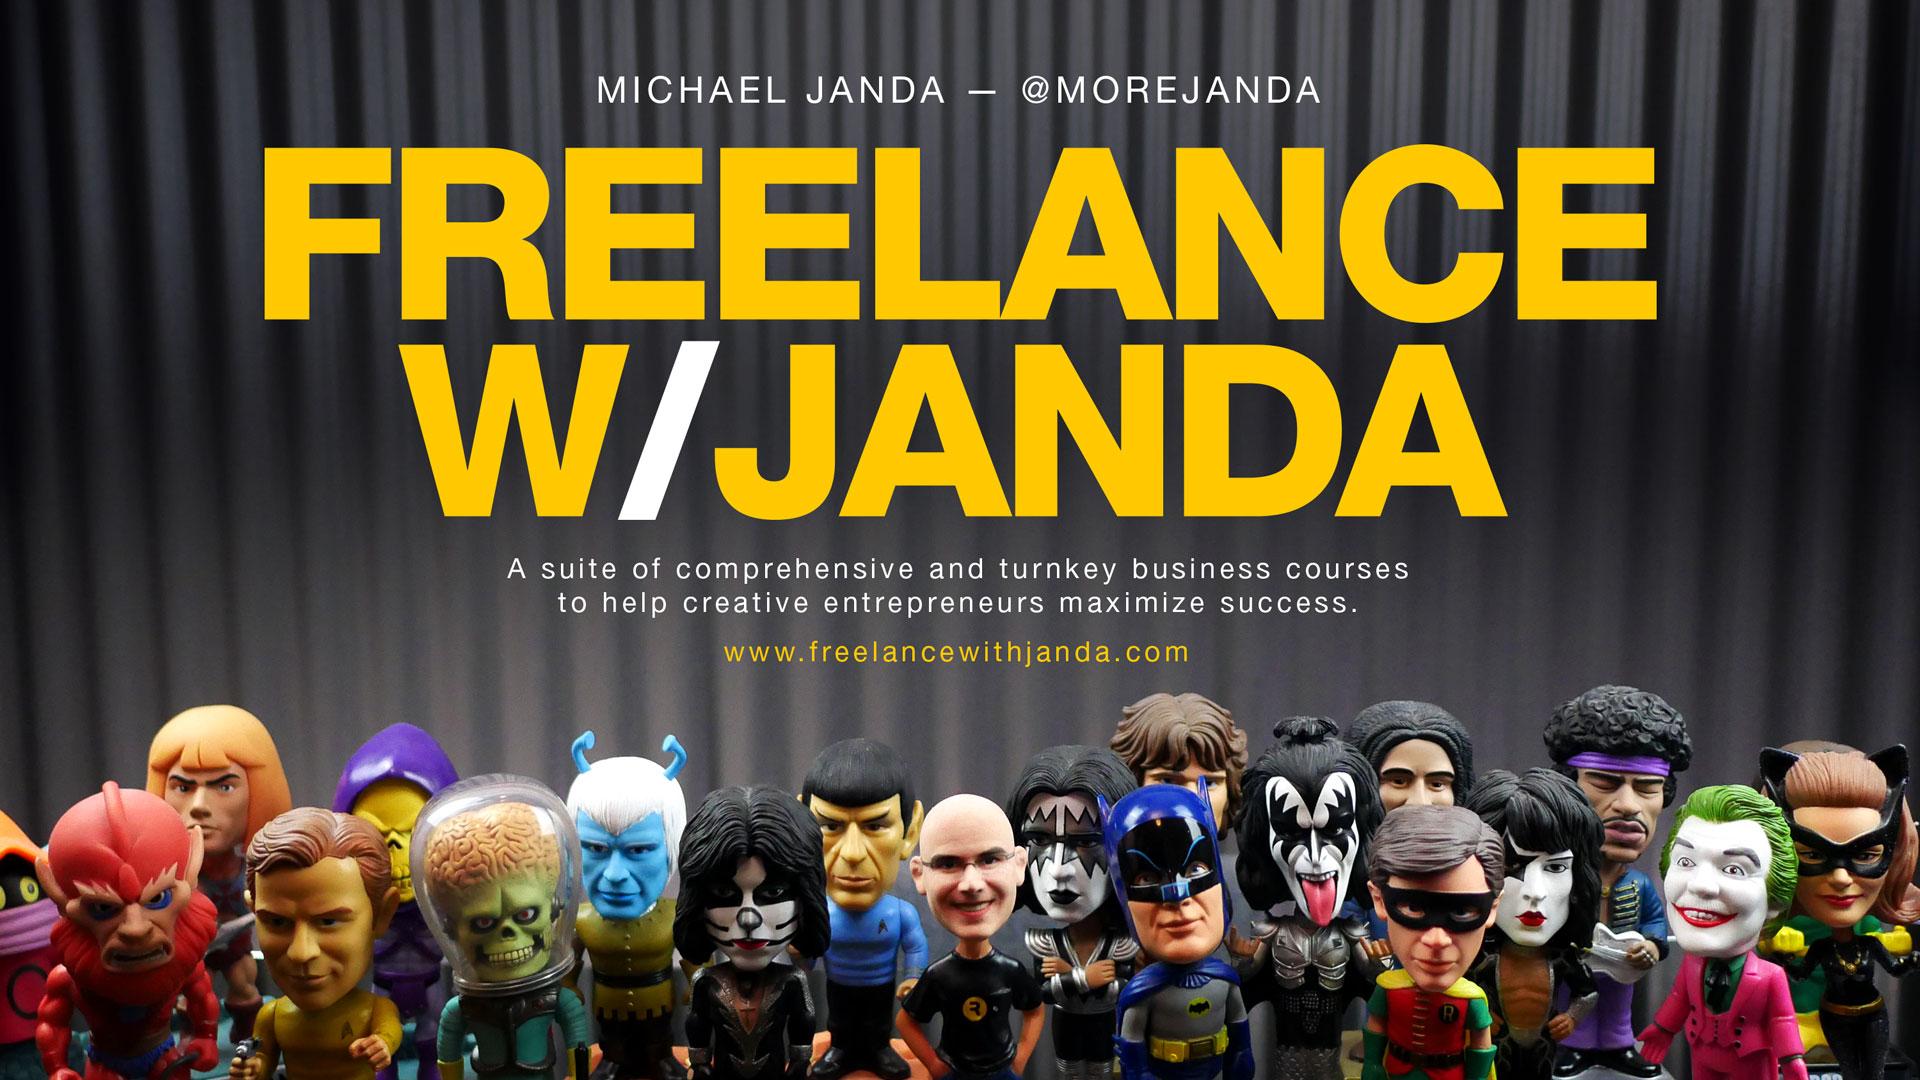 Learn Freelance with Michael Janda